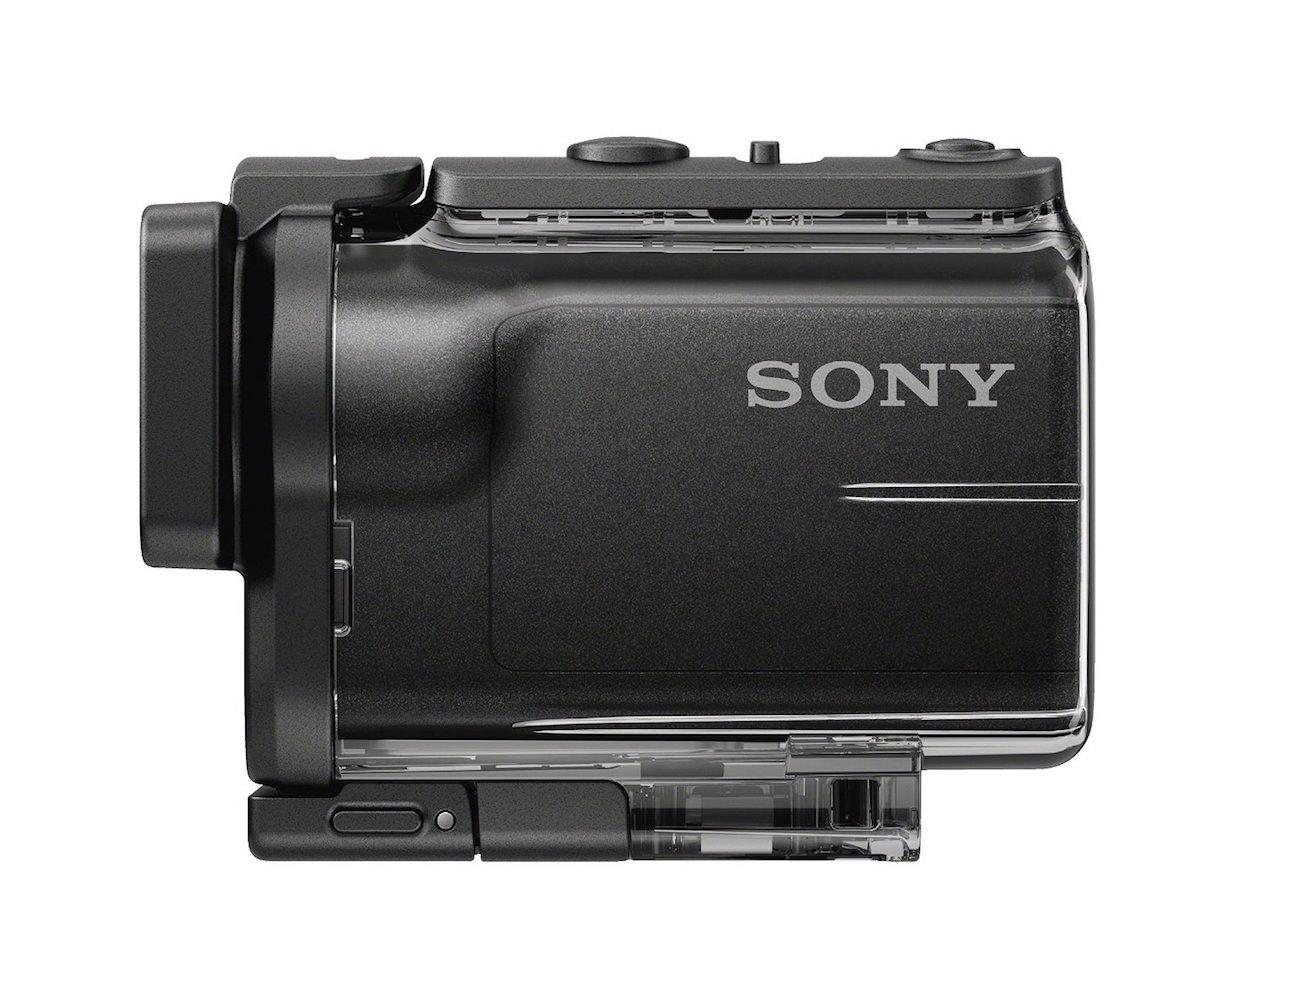 Sony HDRAS50/B Full HD Action Cam